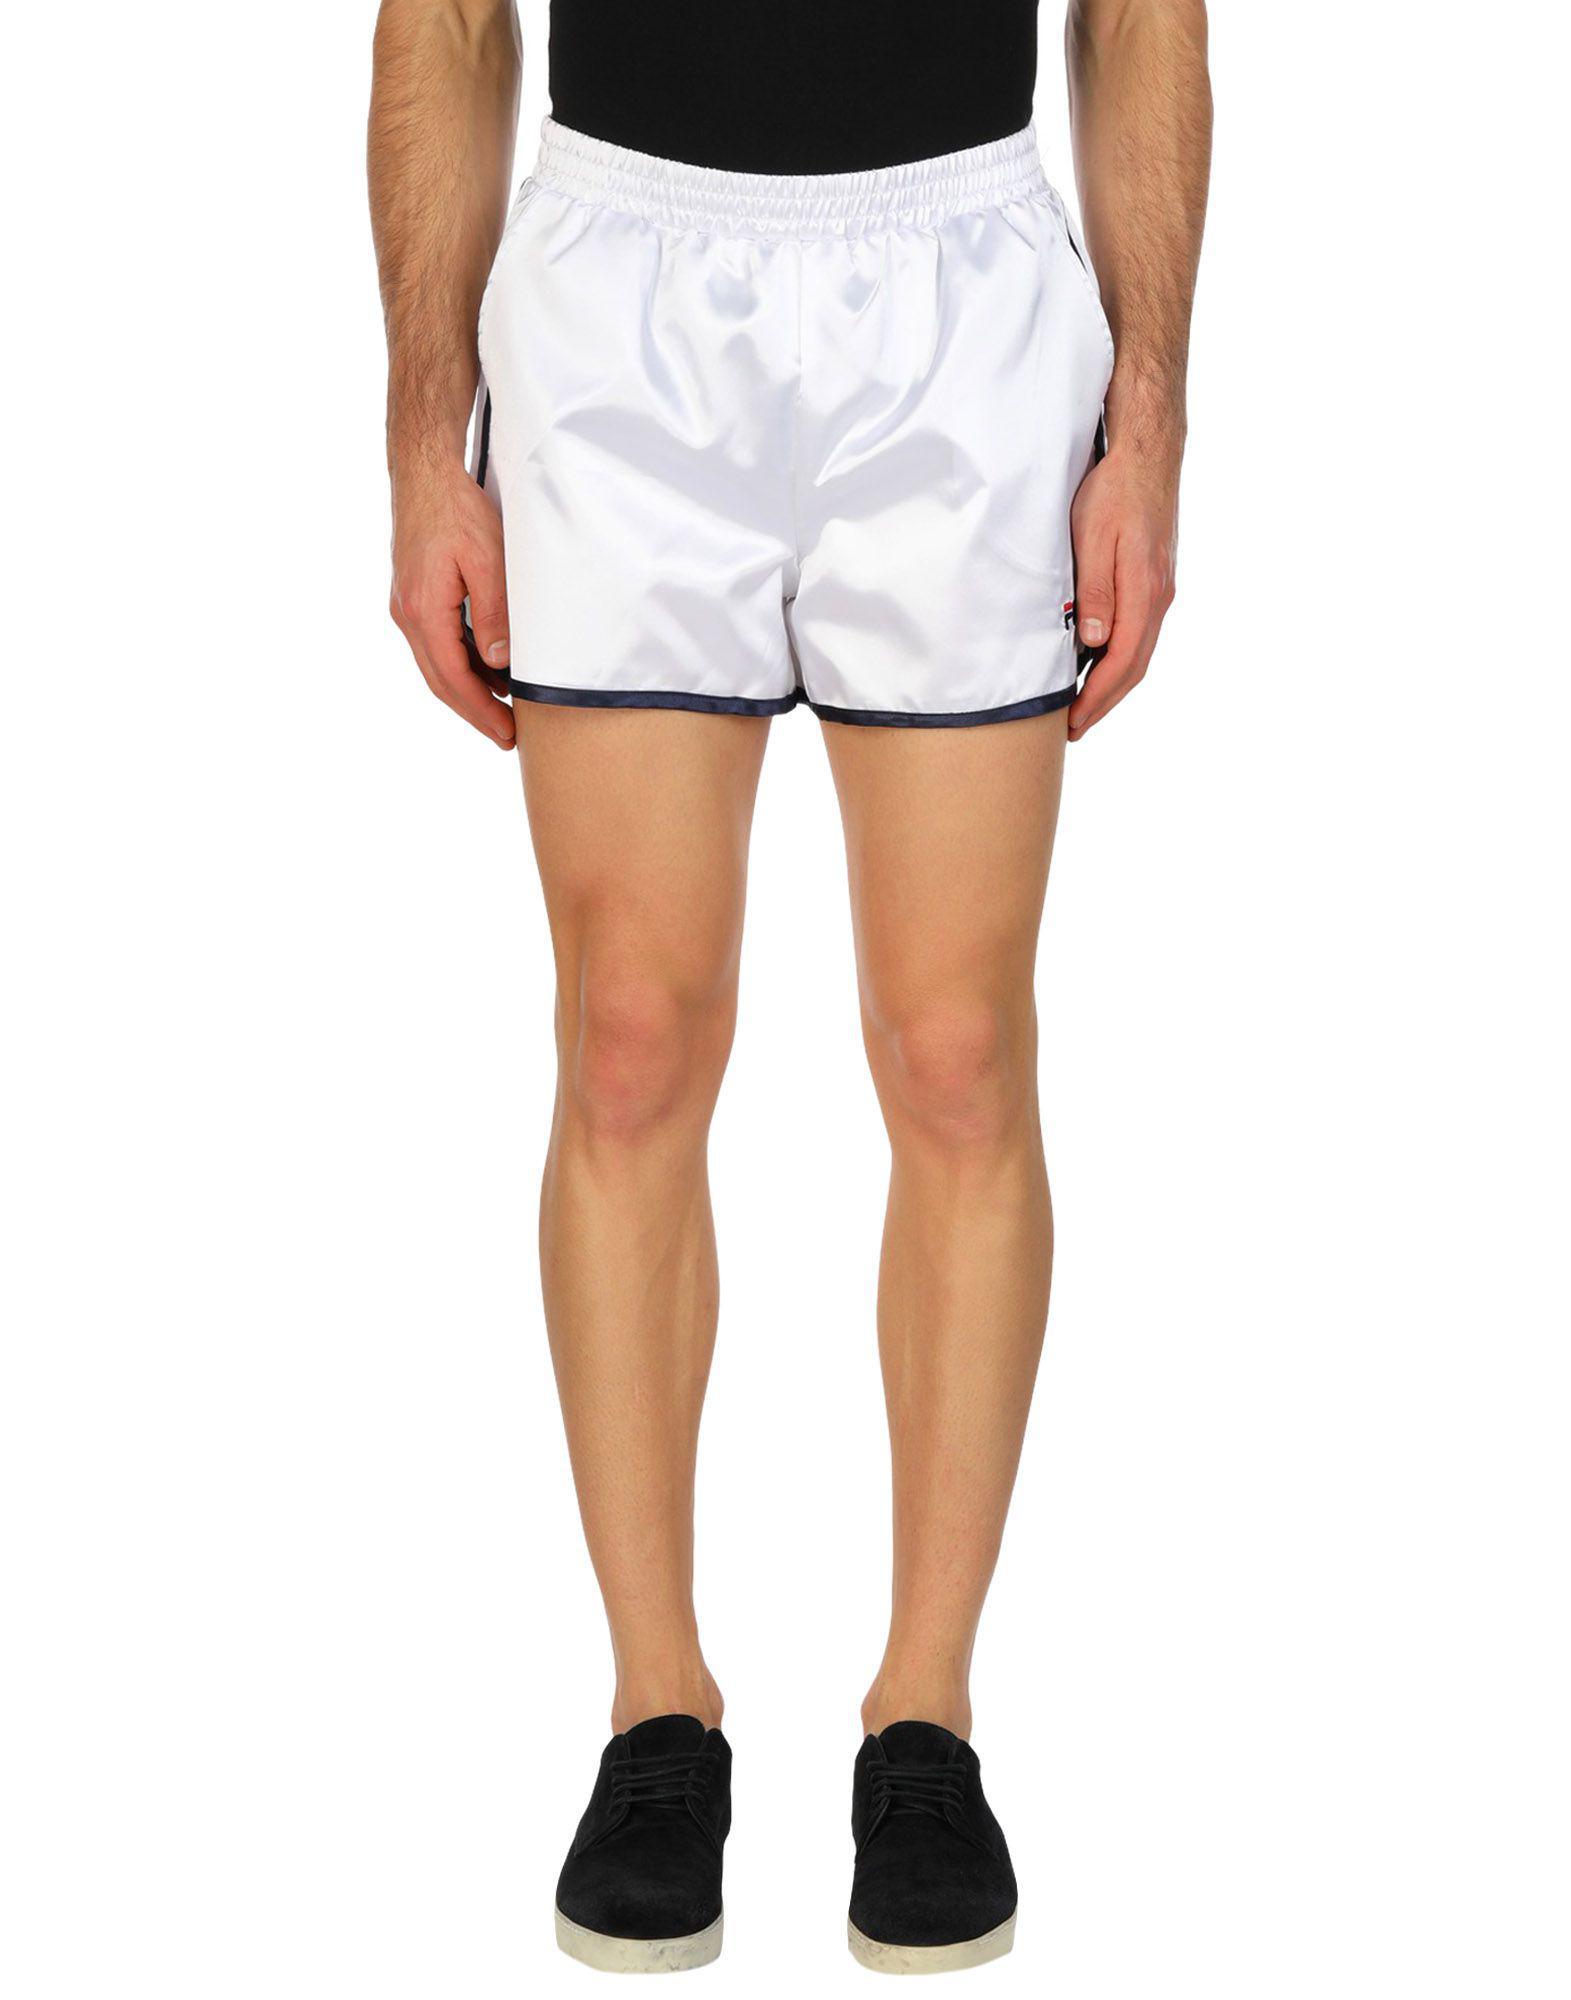 48f92123dd20a Lyst - Fila Shorts in White for Men